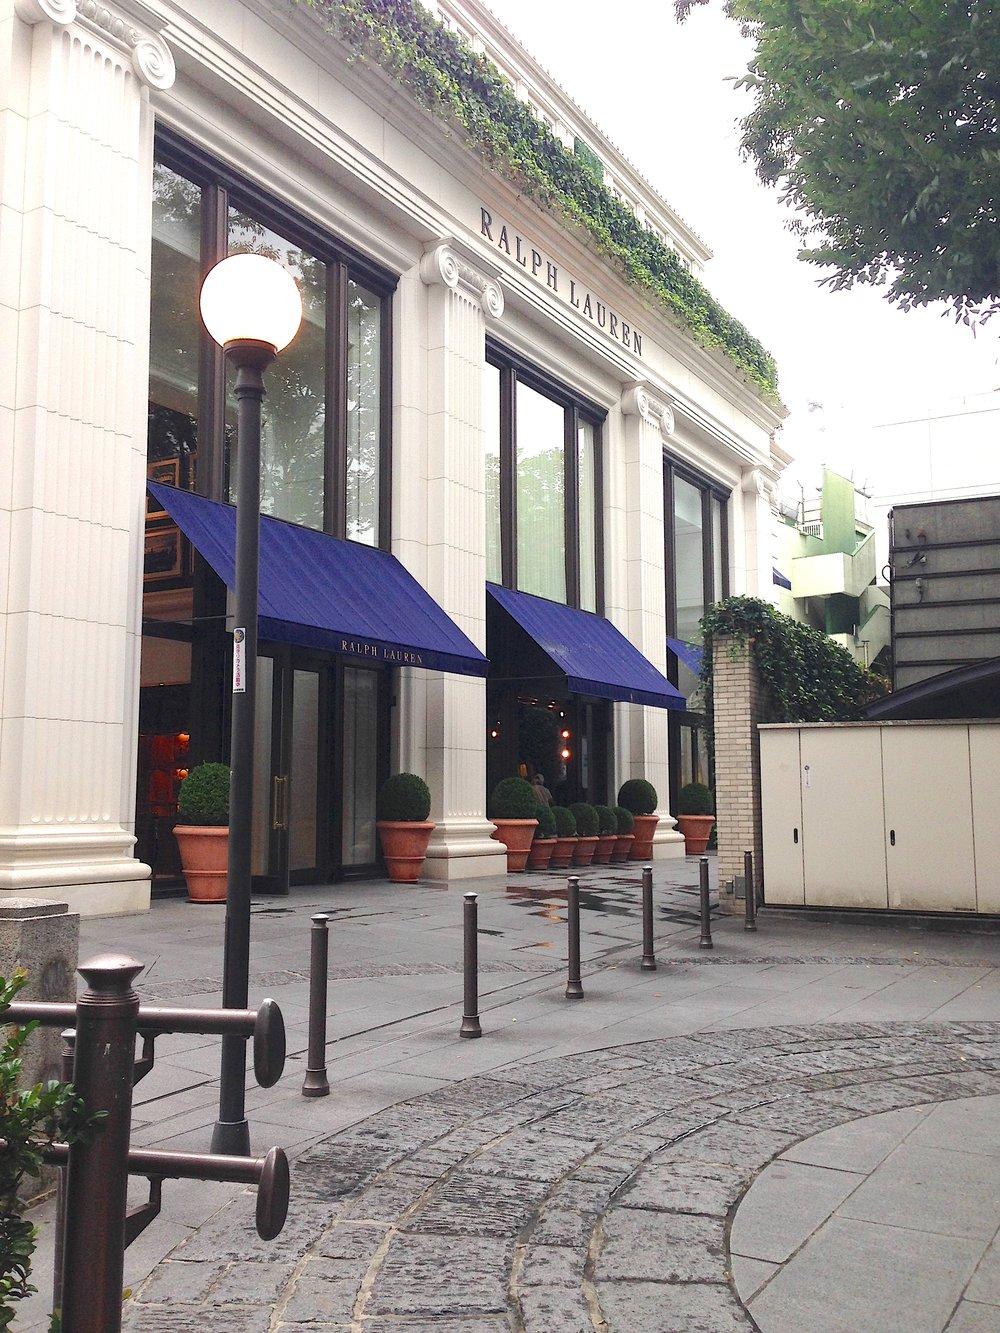 RALPH LAUREN - Fashion & Lifestyle Spots in Tokyo, Japan - DROP